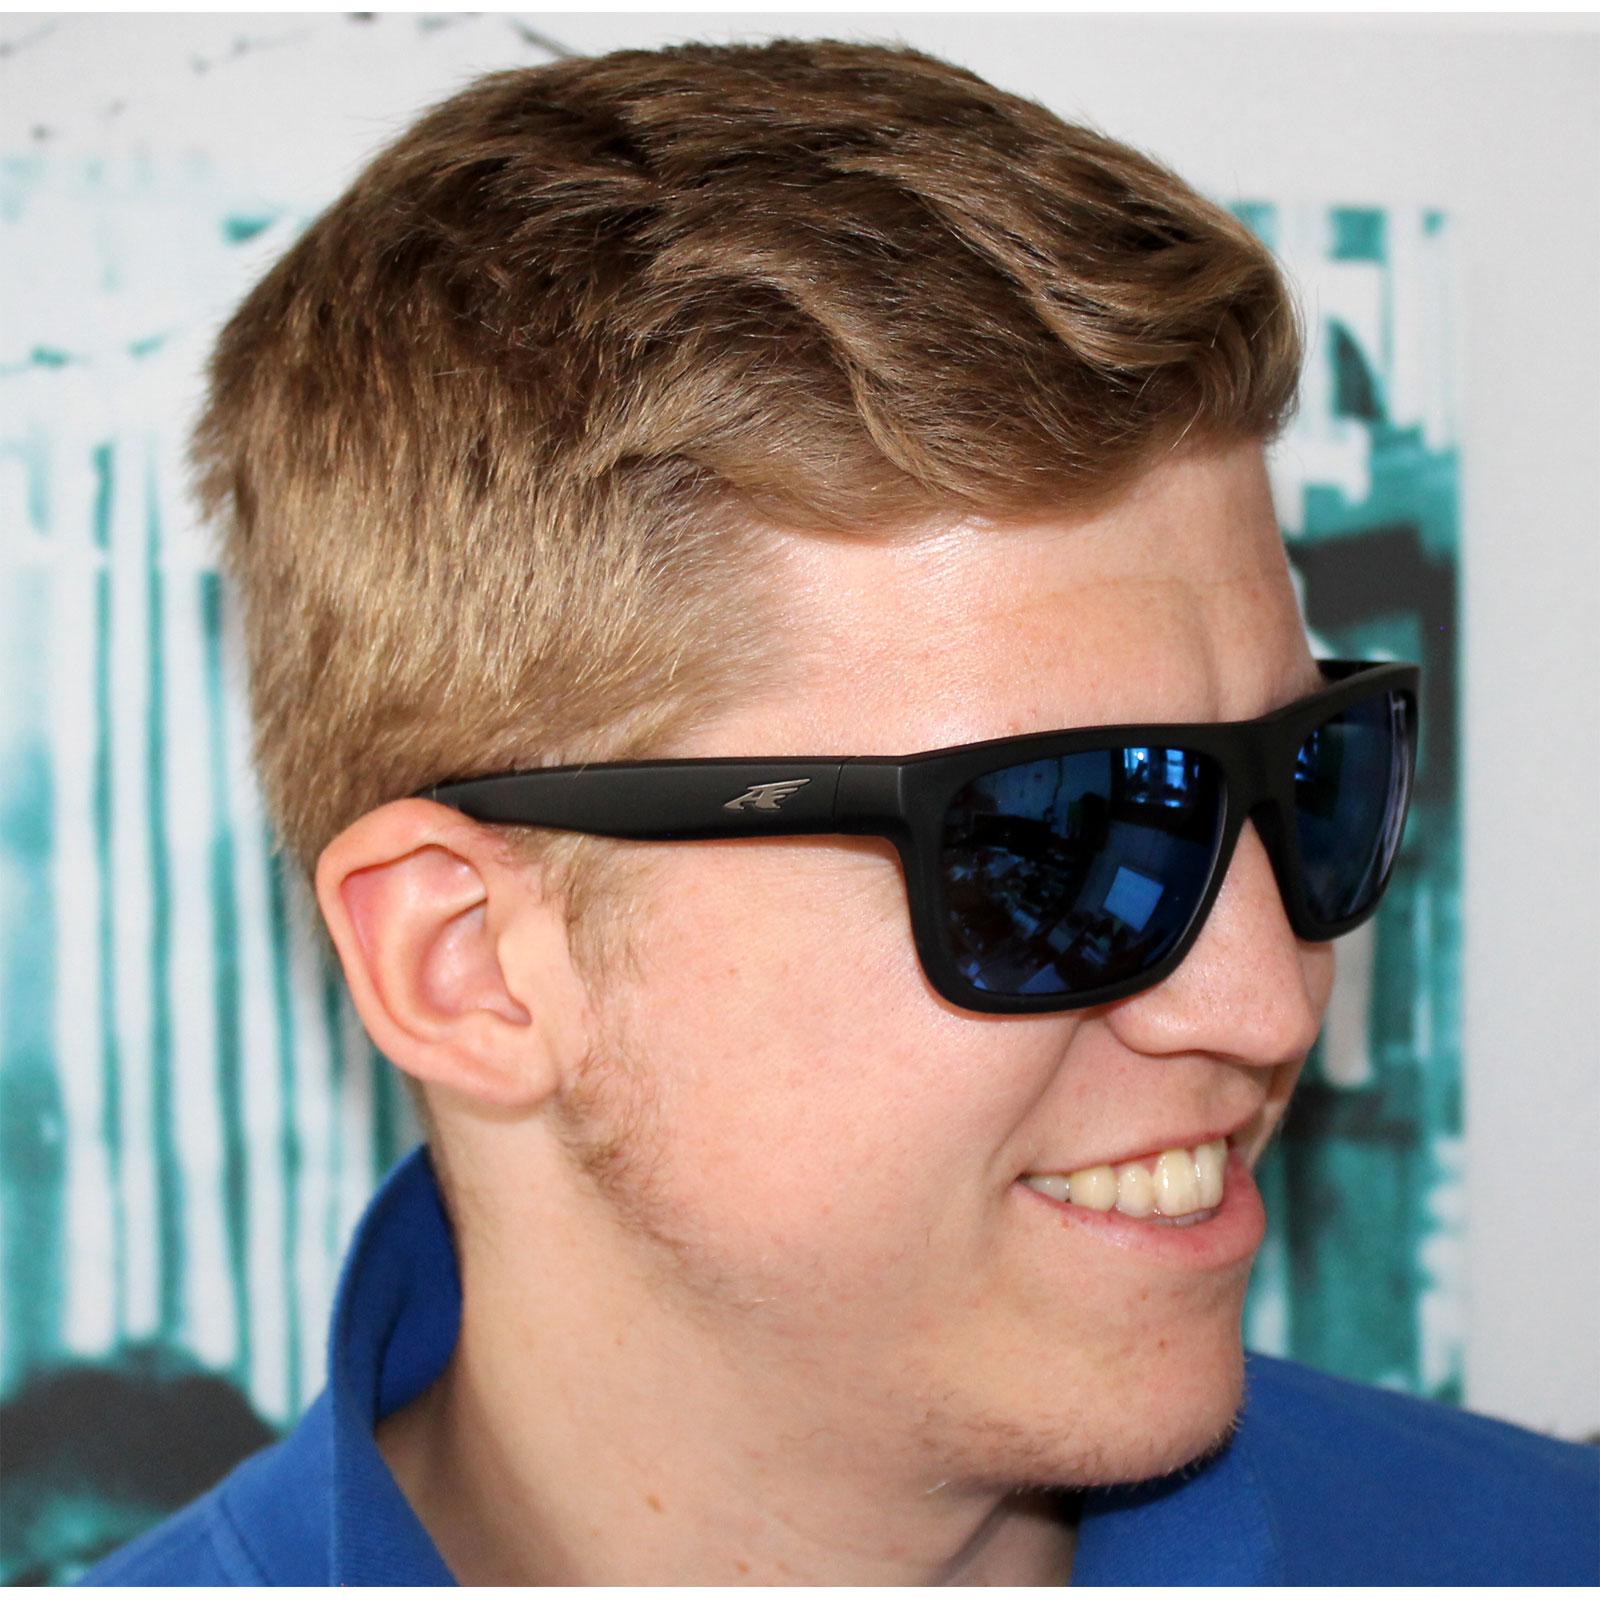 8ed503c599f Sentinel Arnette Sunglasses 4176 Dropout 225455 Fuzzy Black Fade to  Blueberry Blue Mirror